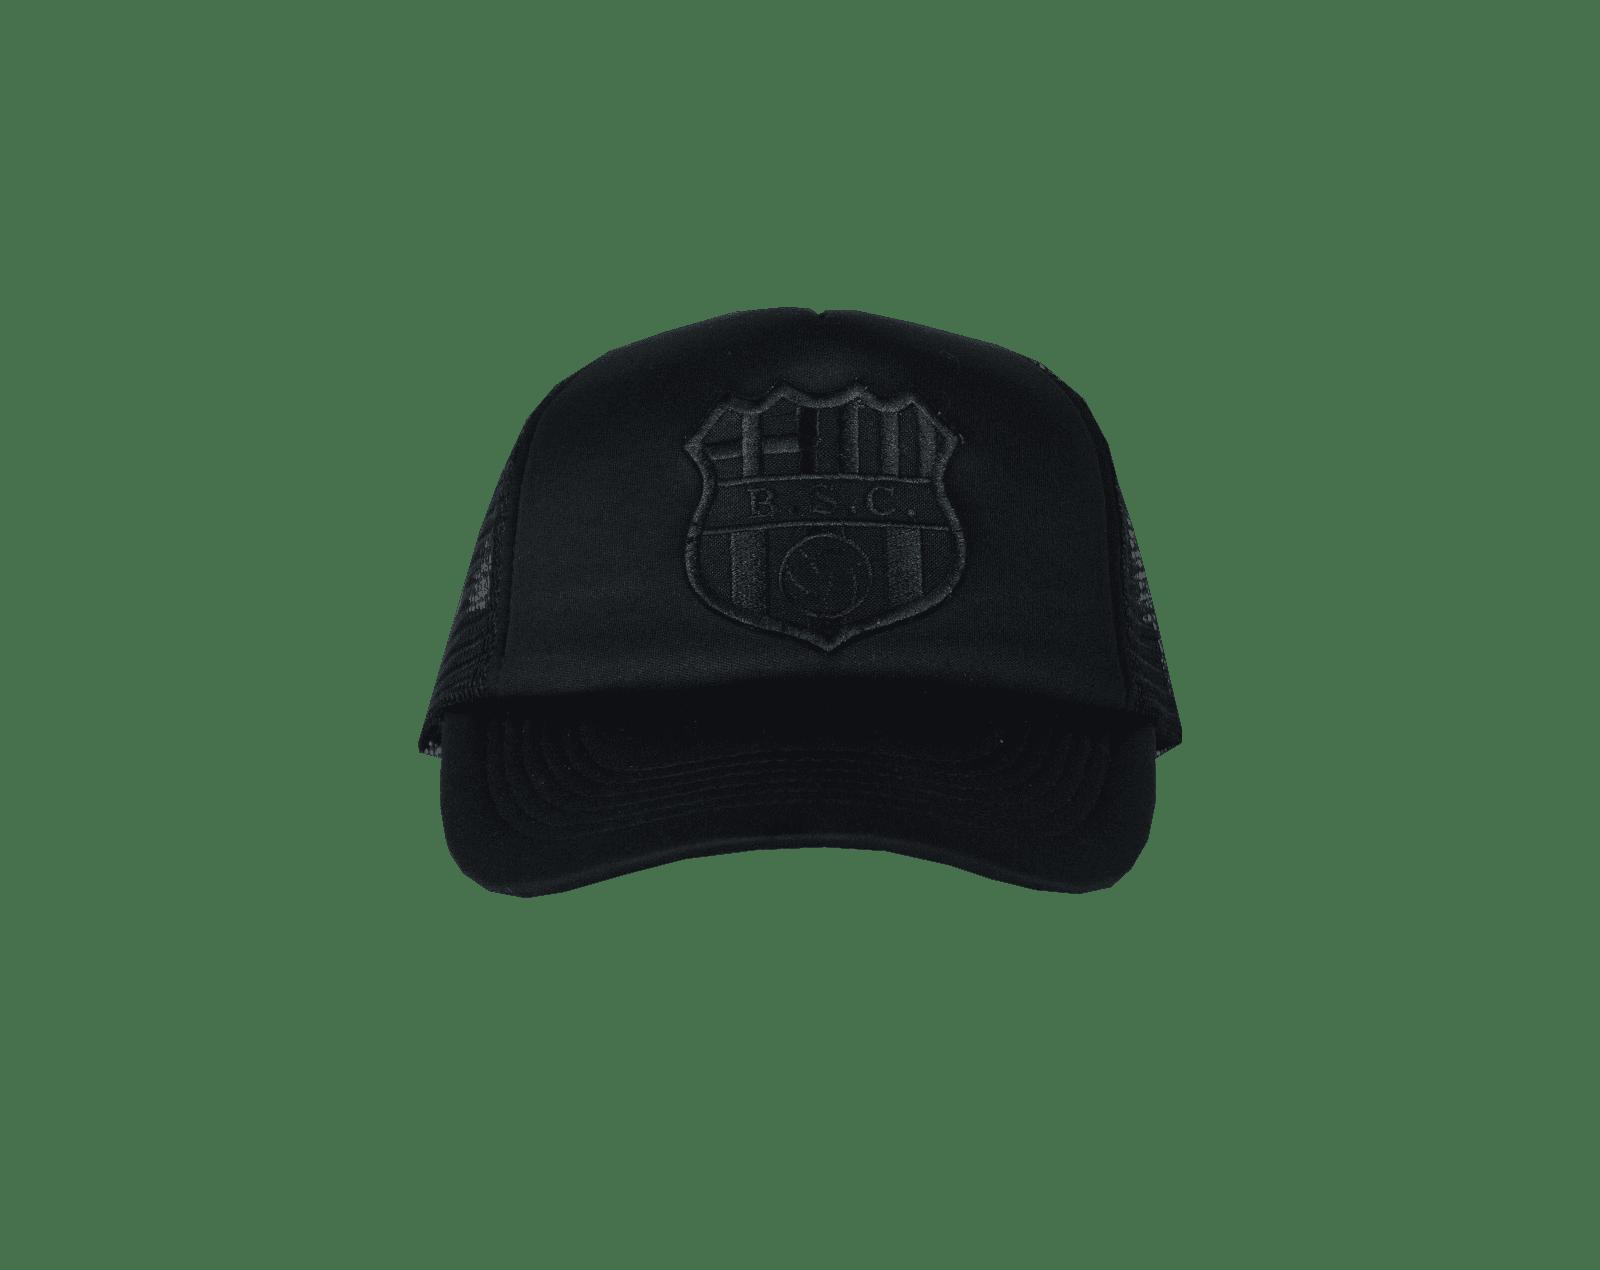 BSC Trucker black.  30. Gorra Camionera Oficial Barcelona S.C. 09fee110199